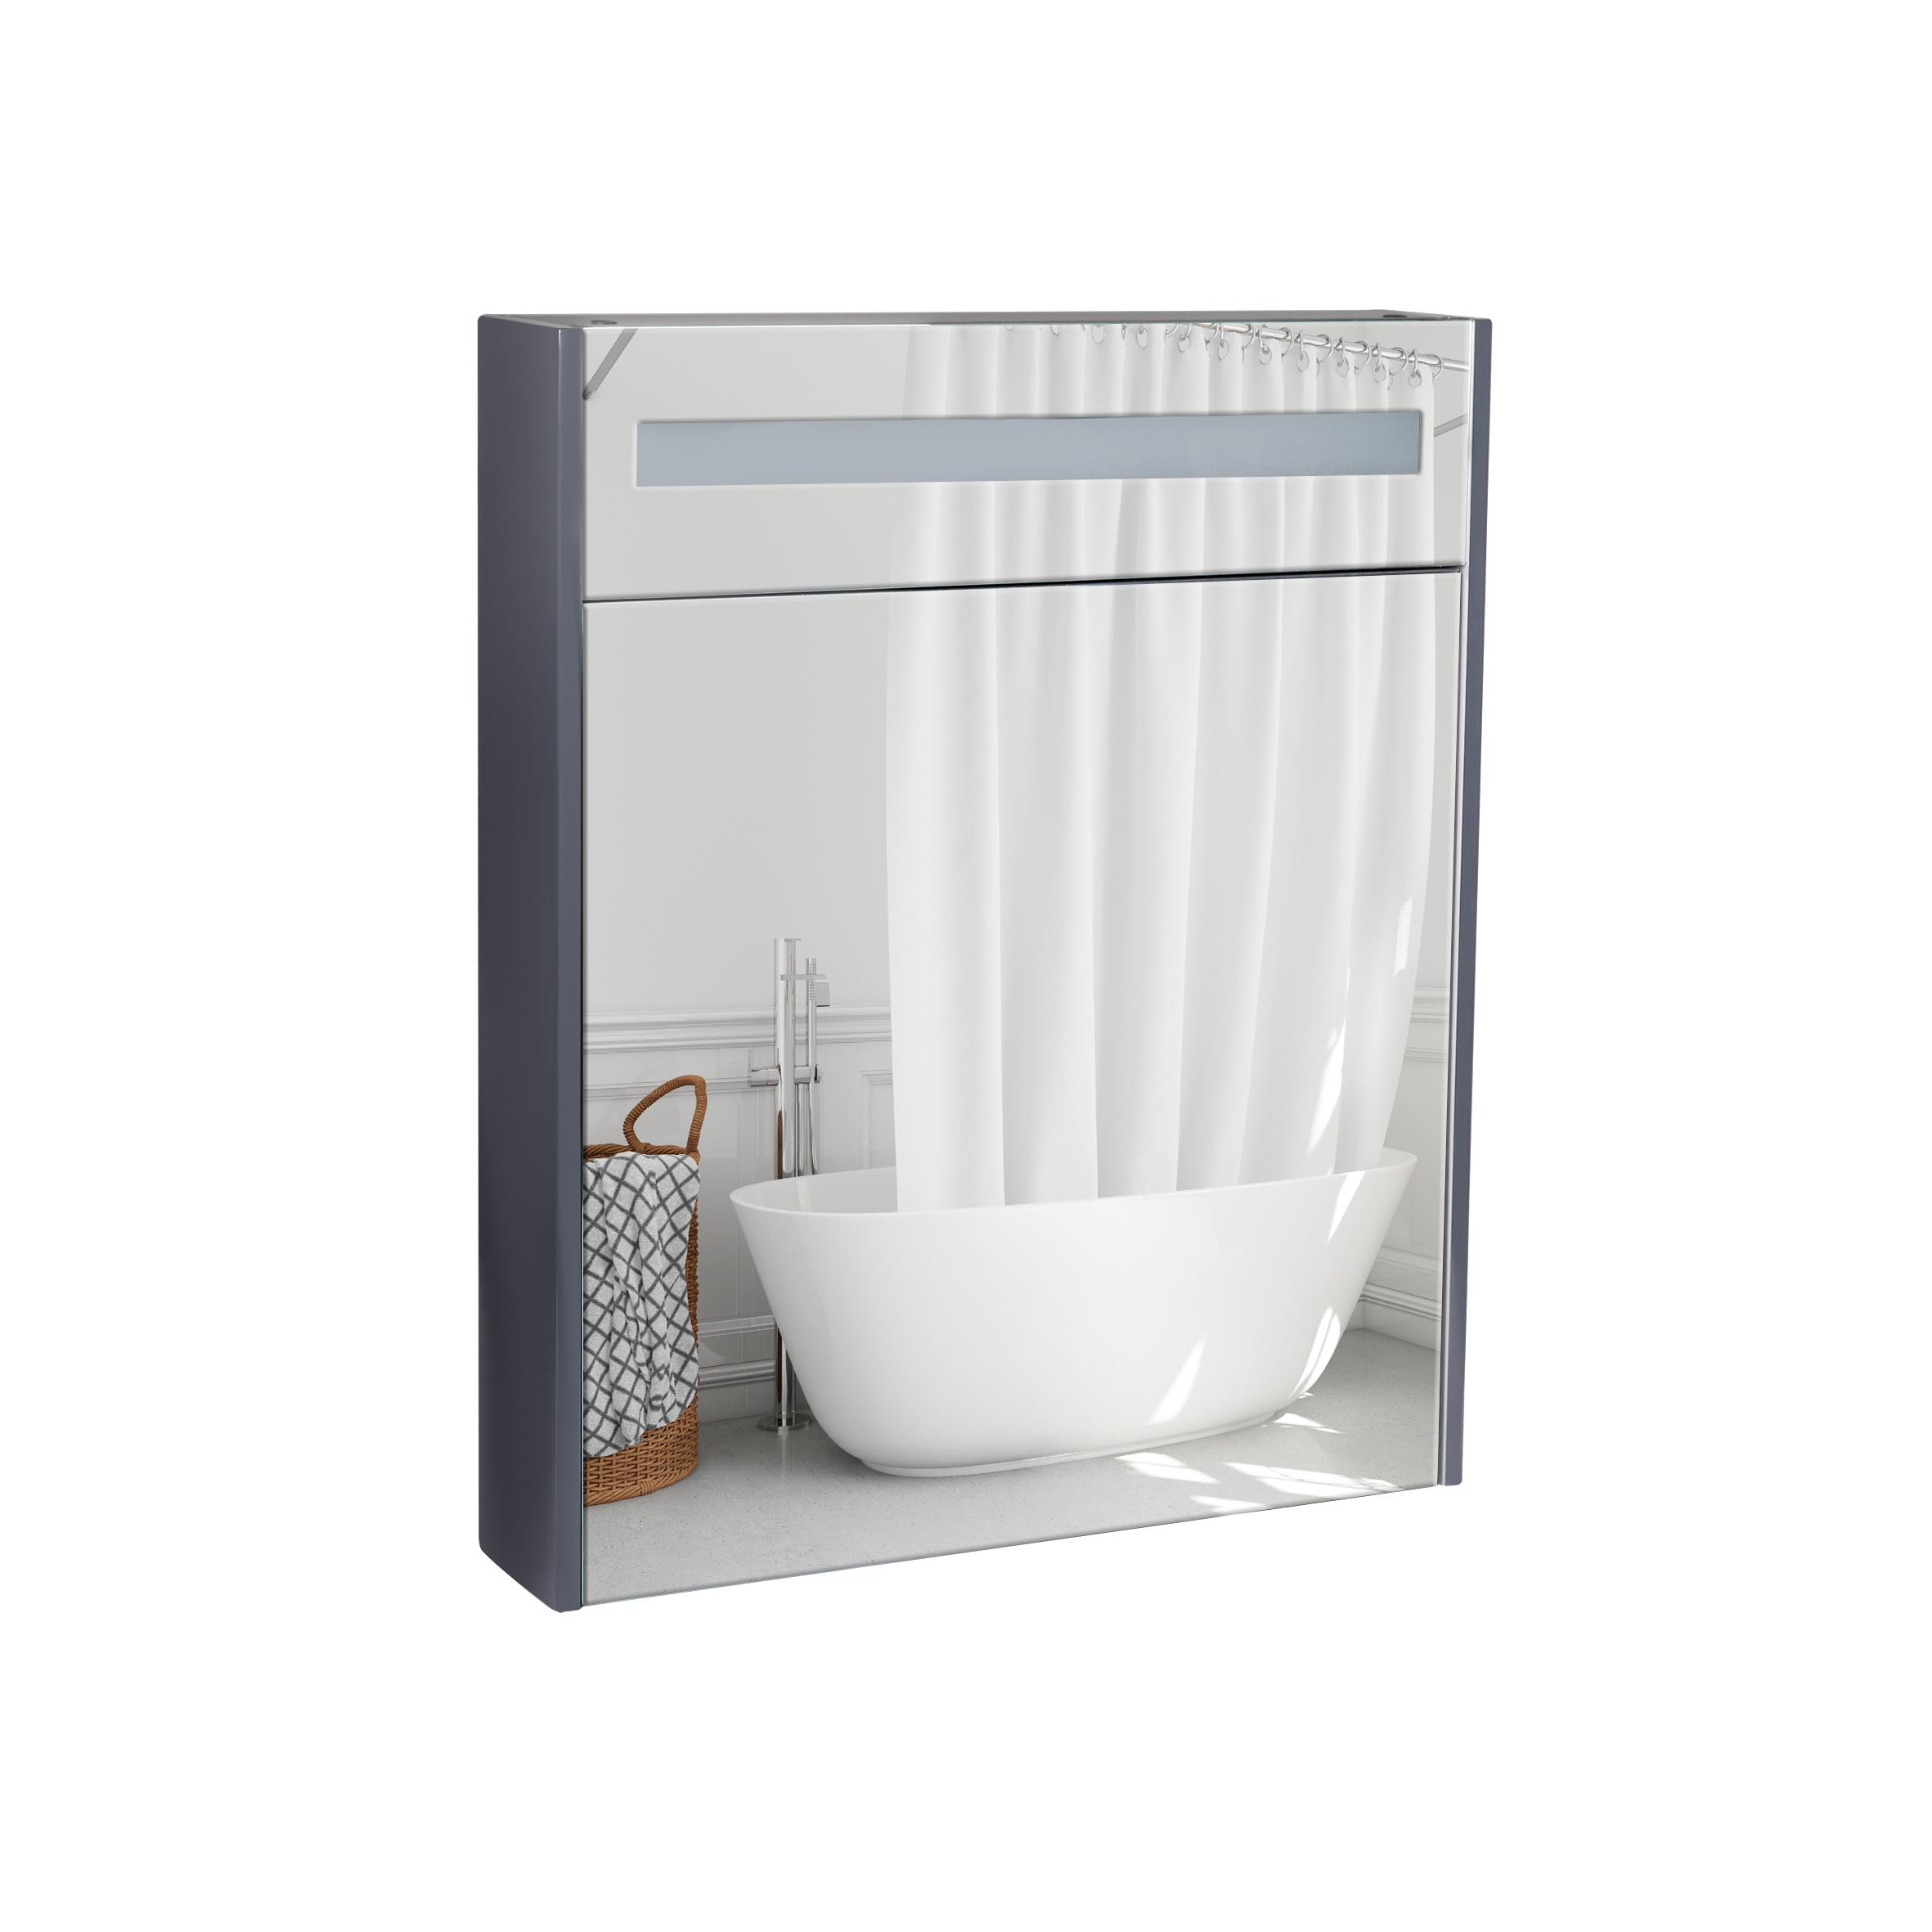 Зеркальный шкаф подвесной Qtap Robin 600х730х145 Graphite с LED-подсветкой QT1377ZP6002G